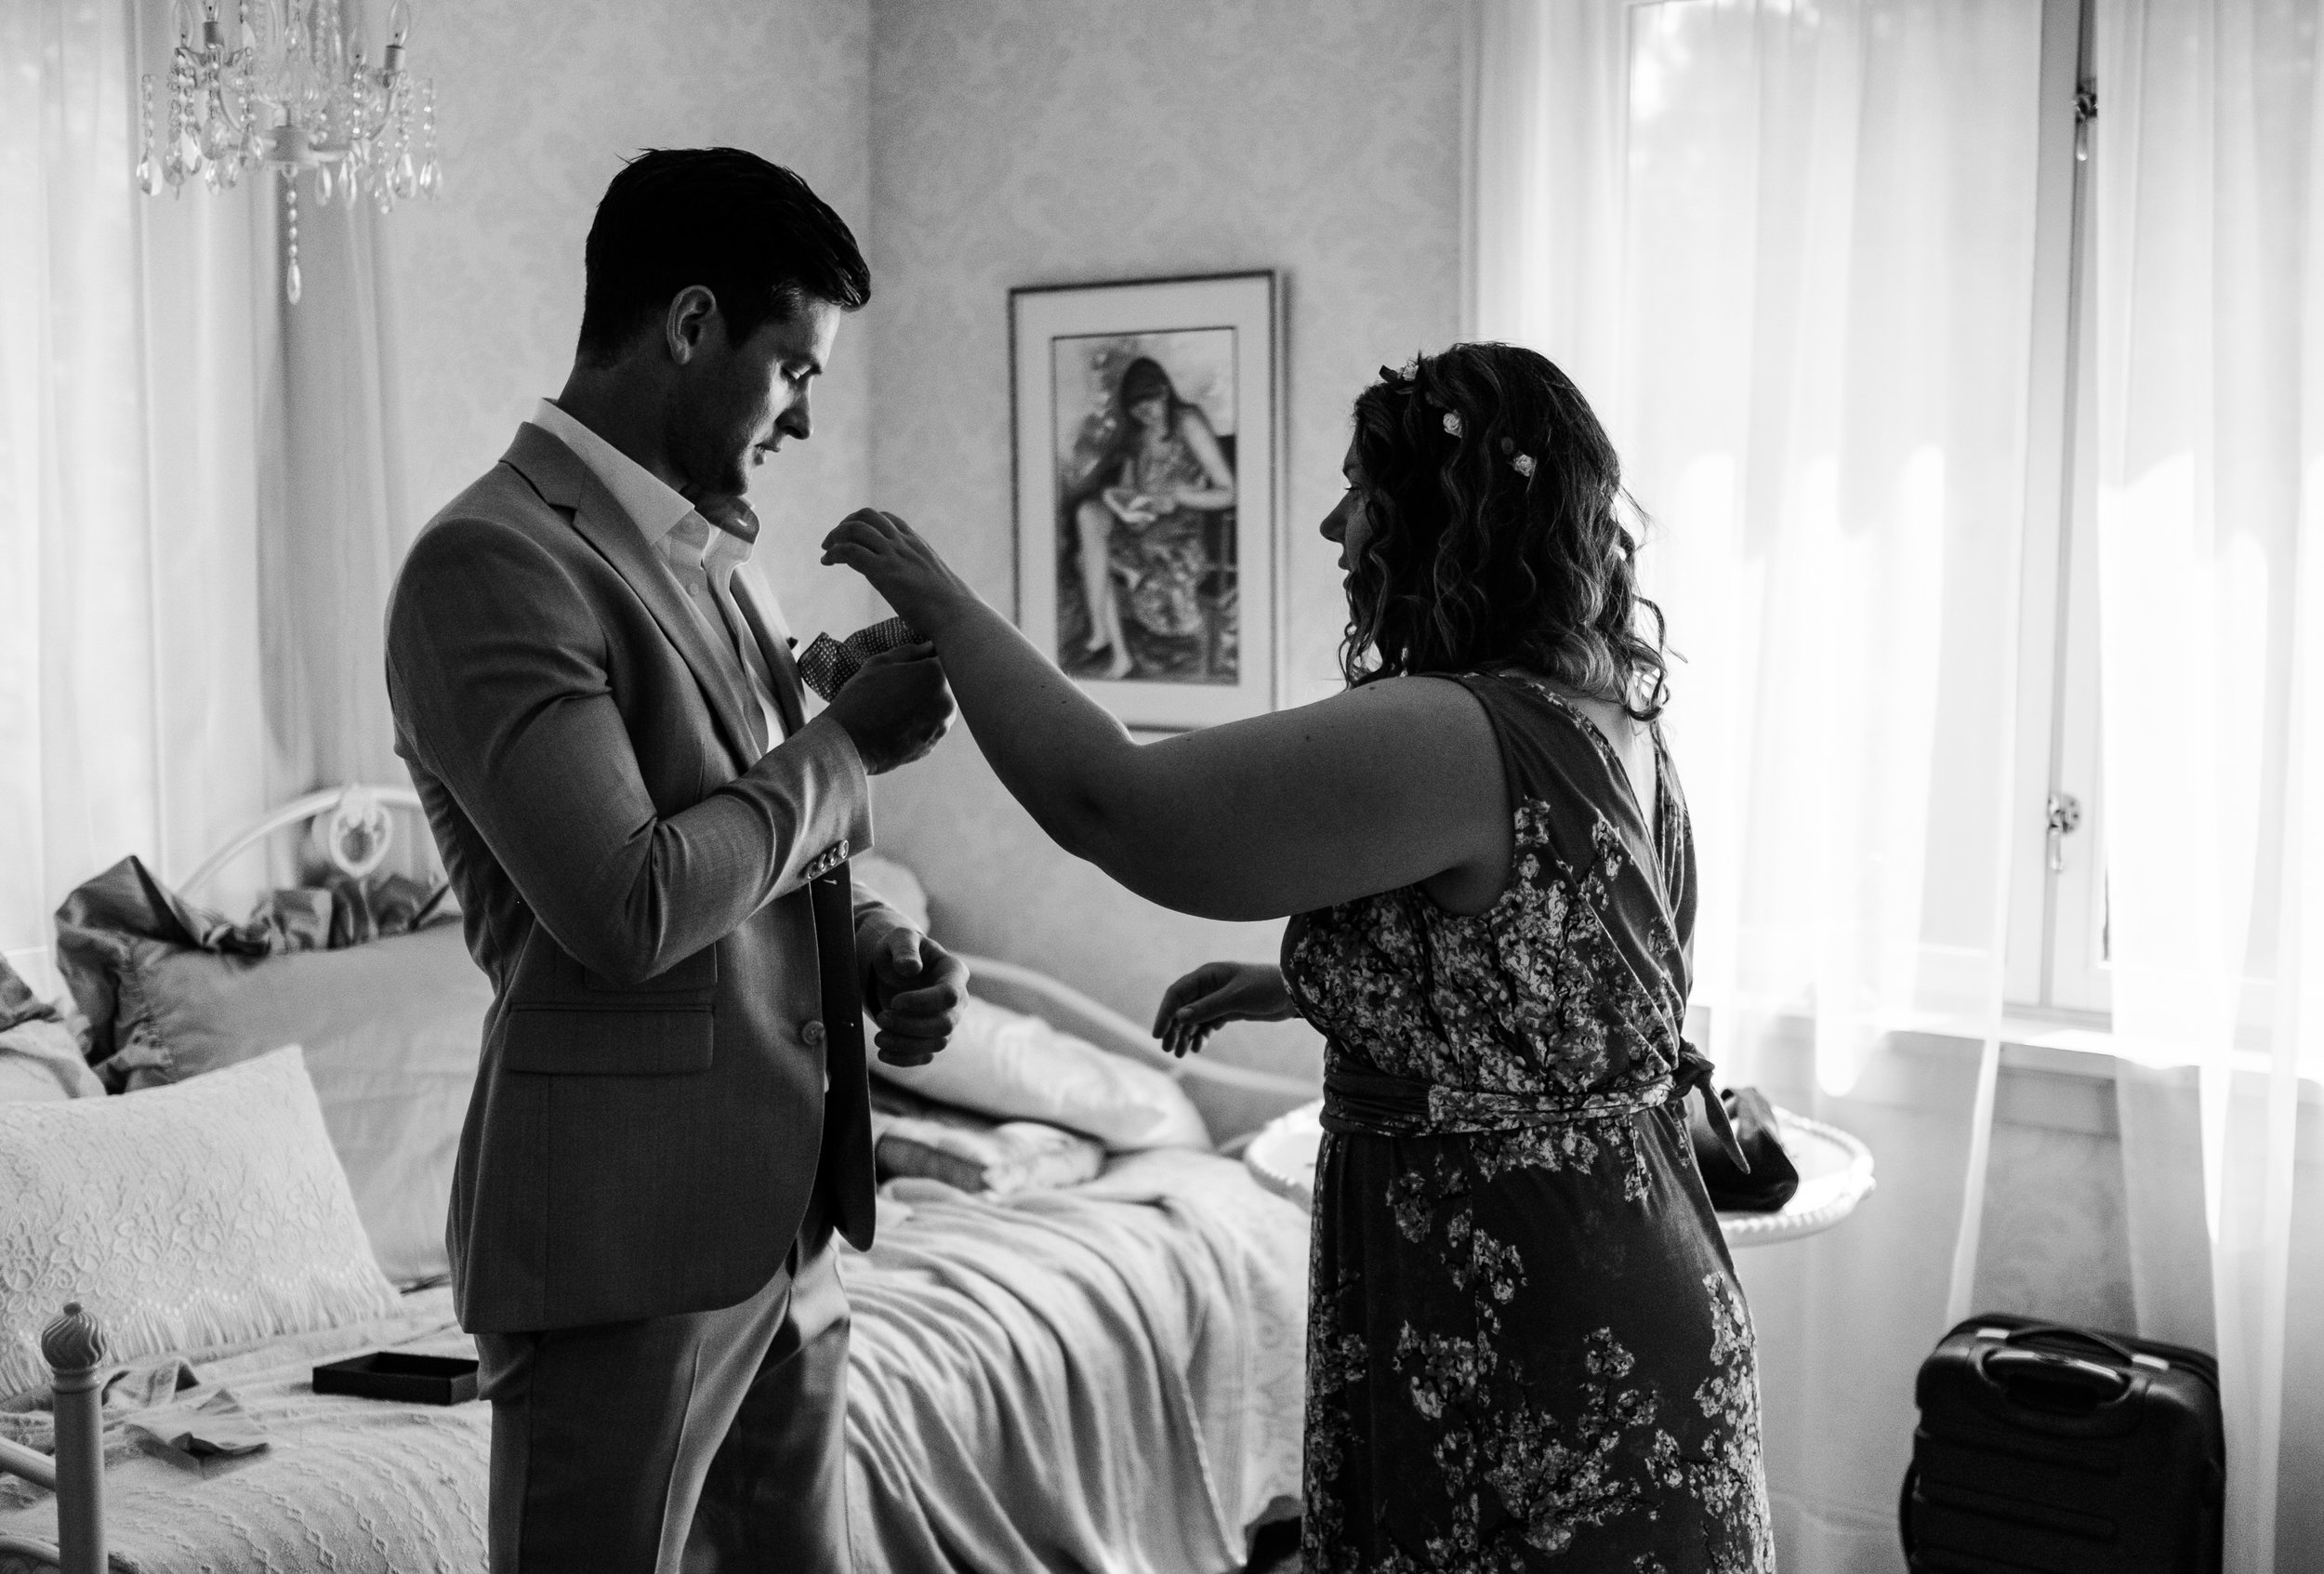 Linwood House Wedding Photos - Roberts Creek Wedding Photos - Vancouver Wedding Photographer & Videographer - Sunshine Coast Wedding Photos - Sunshine Coast Wedding Photographer - Jennifer Picard Photography - DSCF8415.jpg